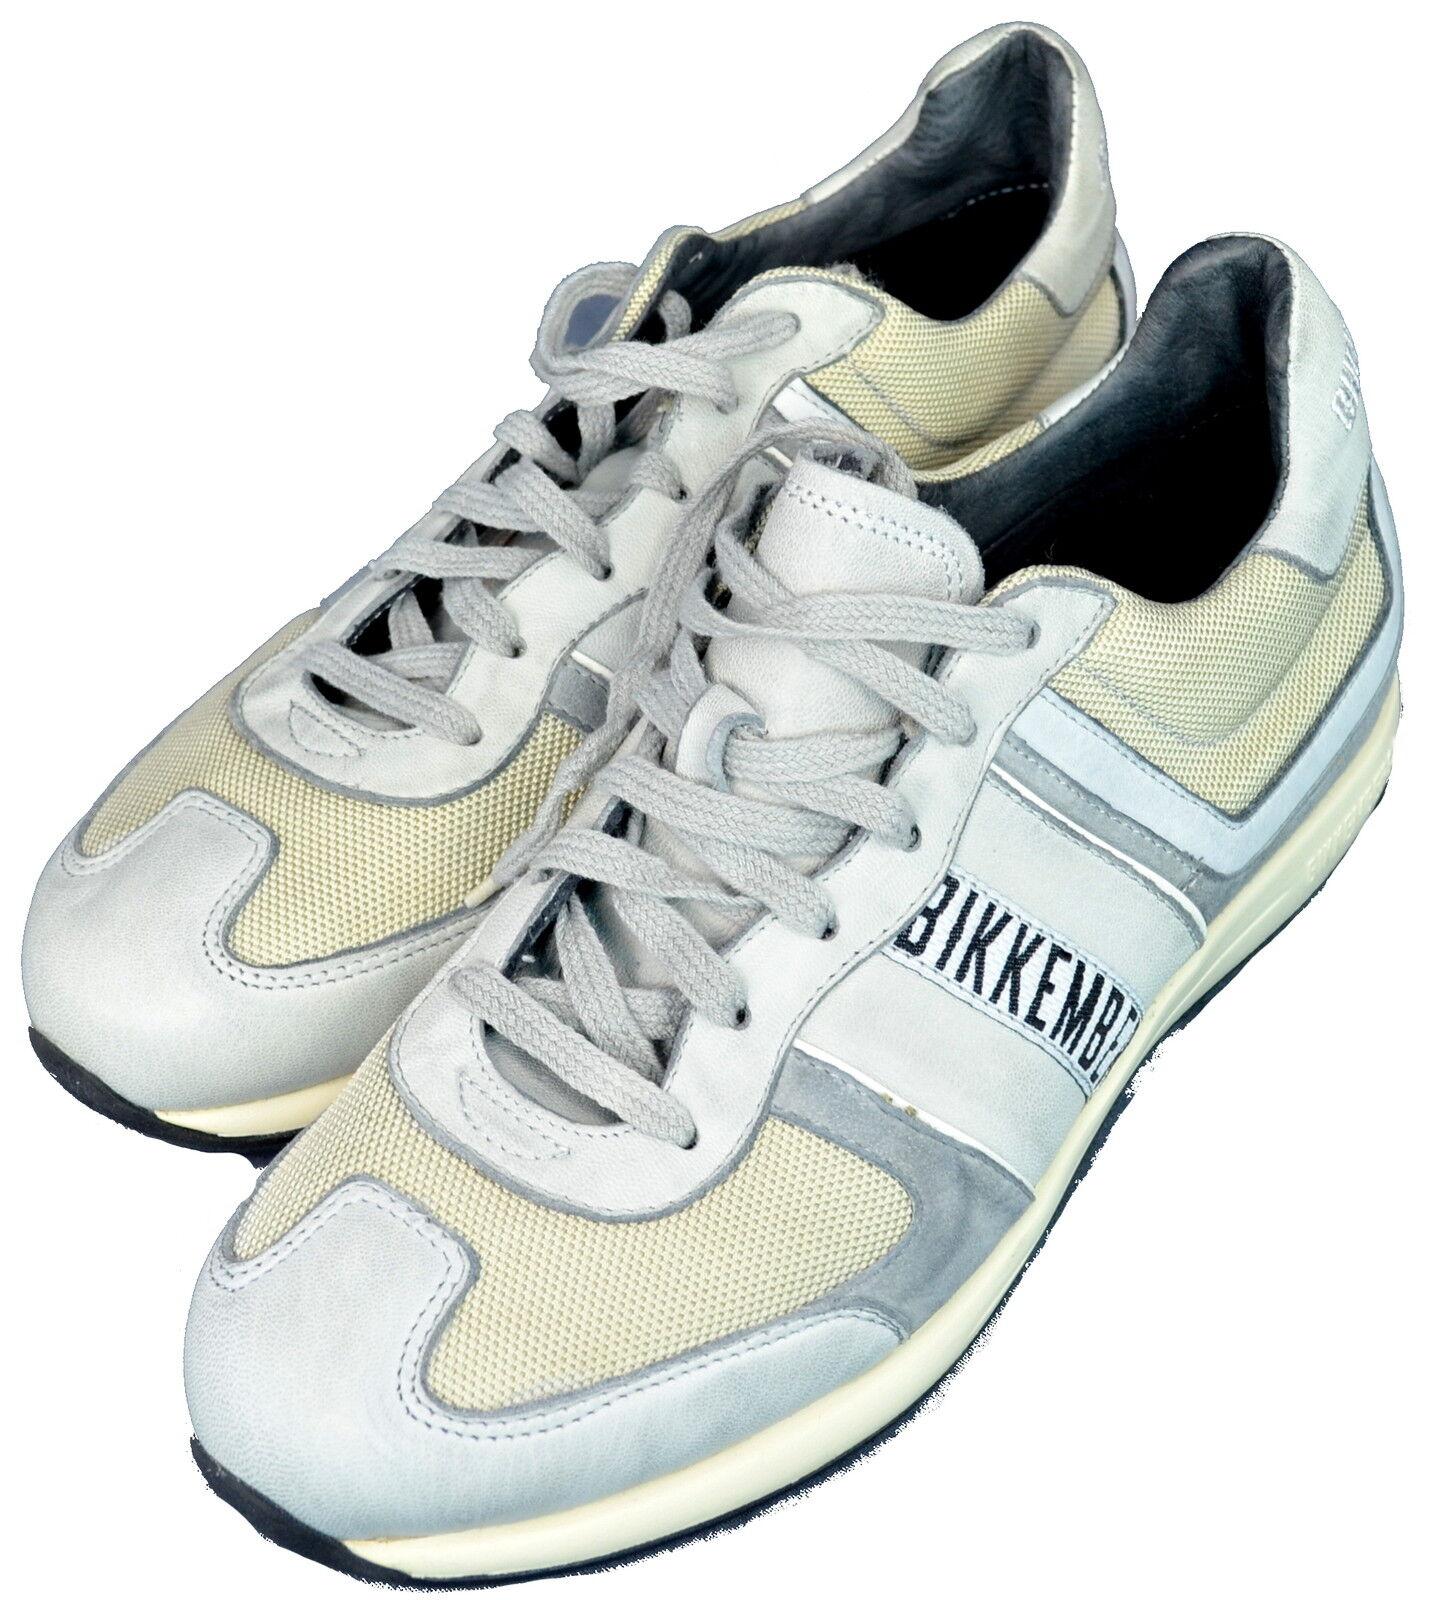 Herrenschuhe schwarz/Creme/grogio Leder Leder Leder und Stoff Bikkembergs Schuhe Mann black/ 3632d3